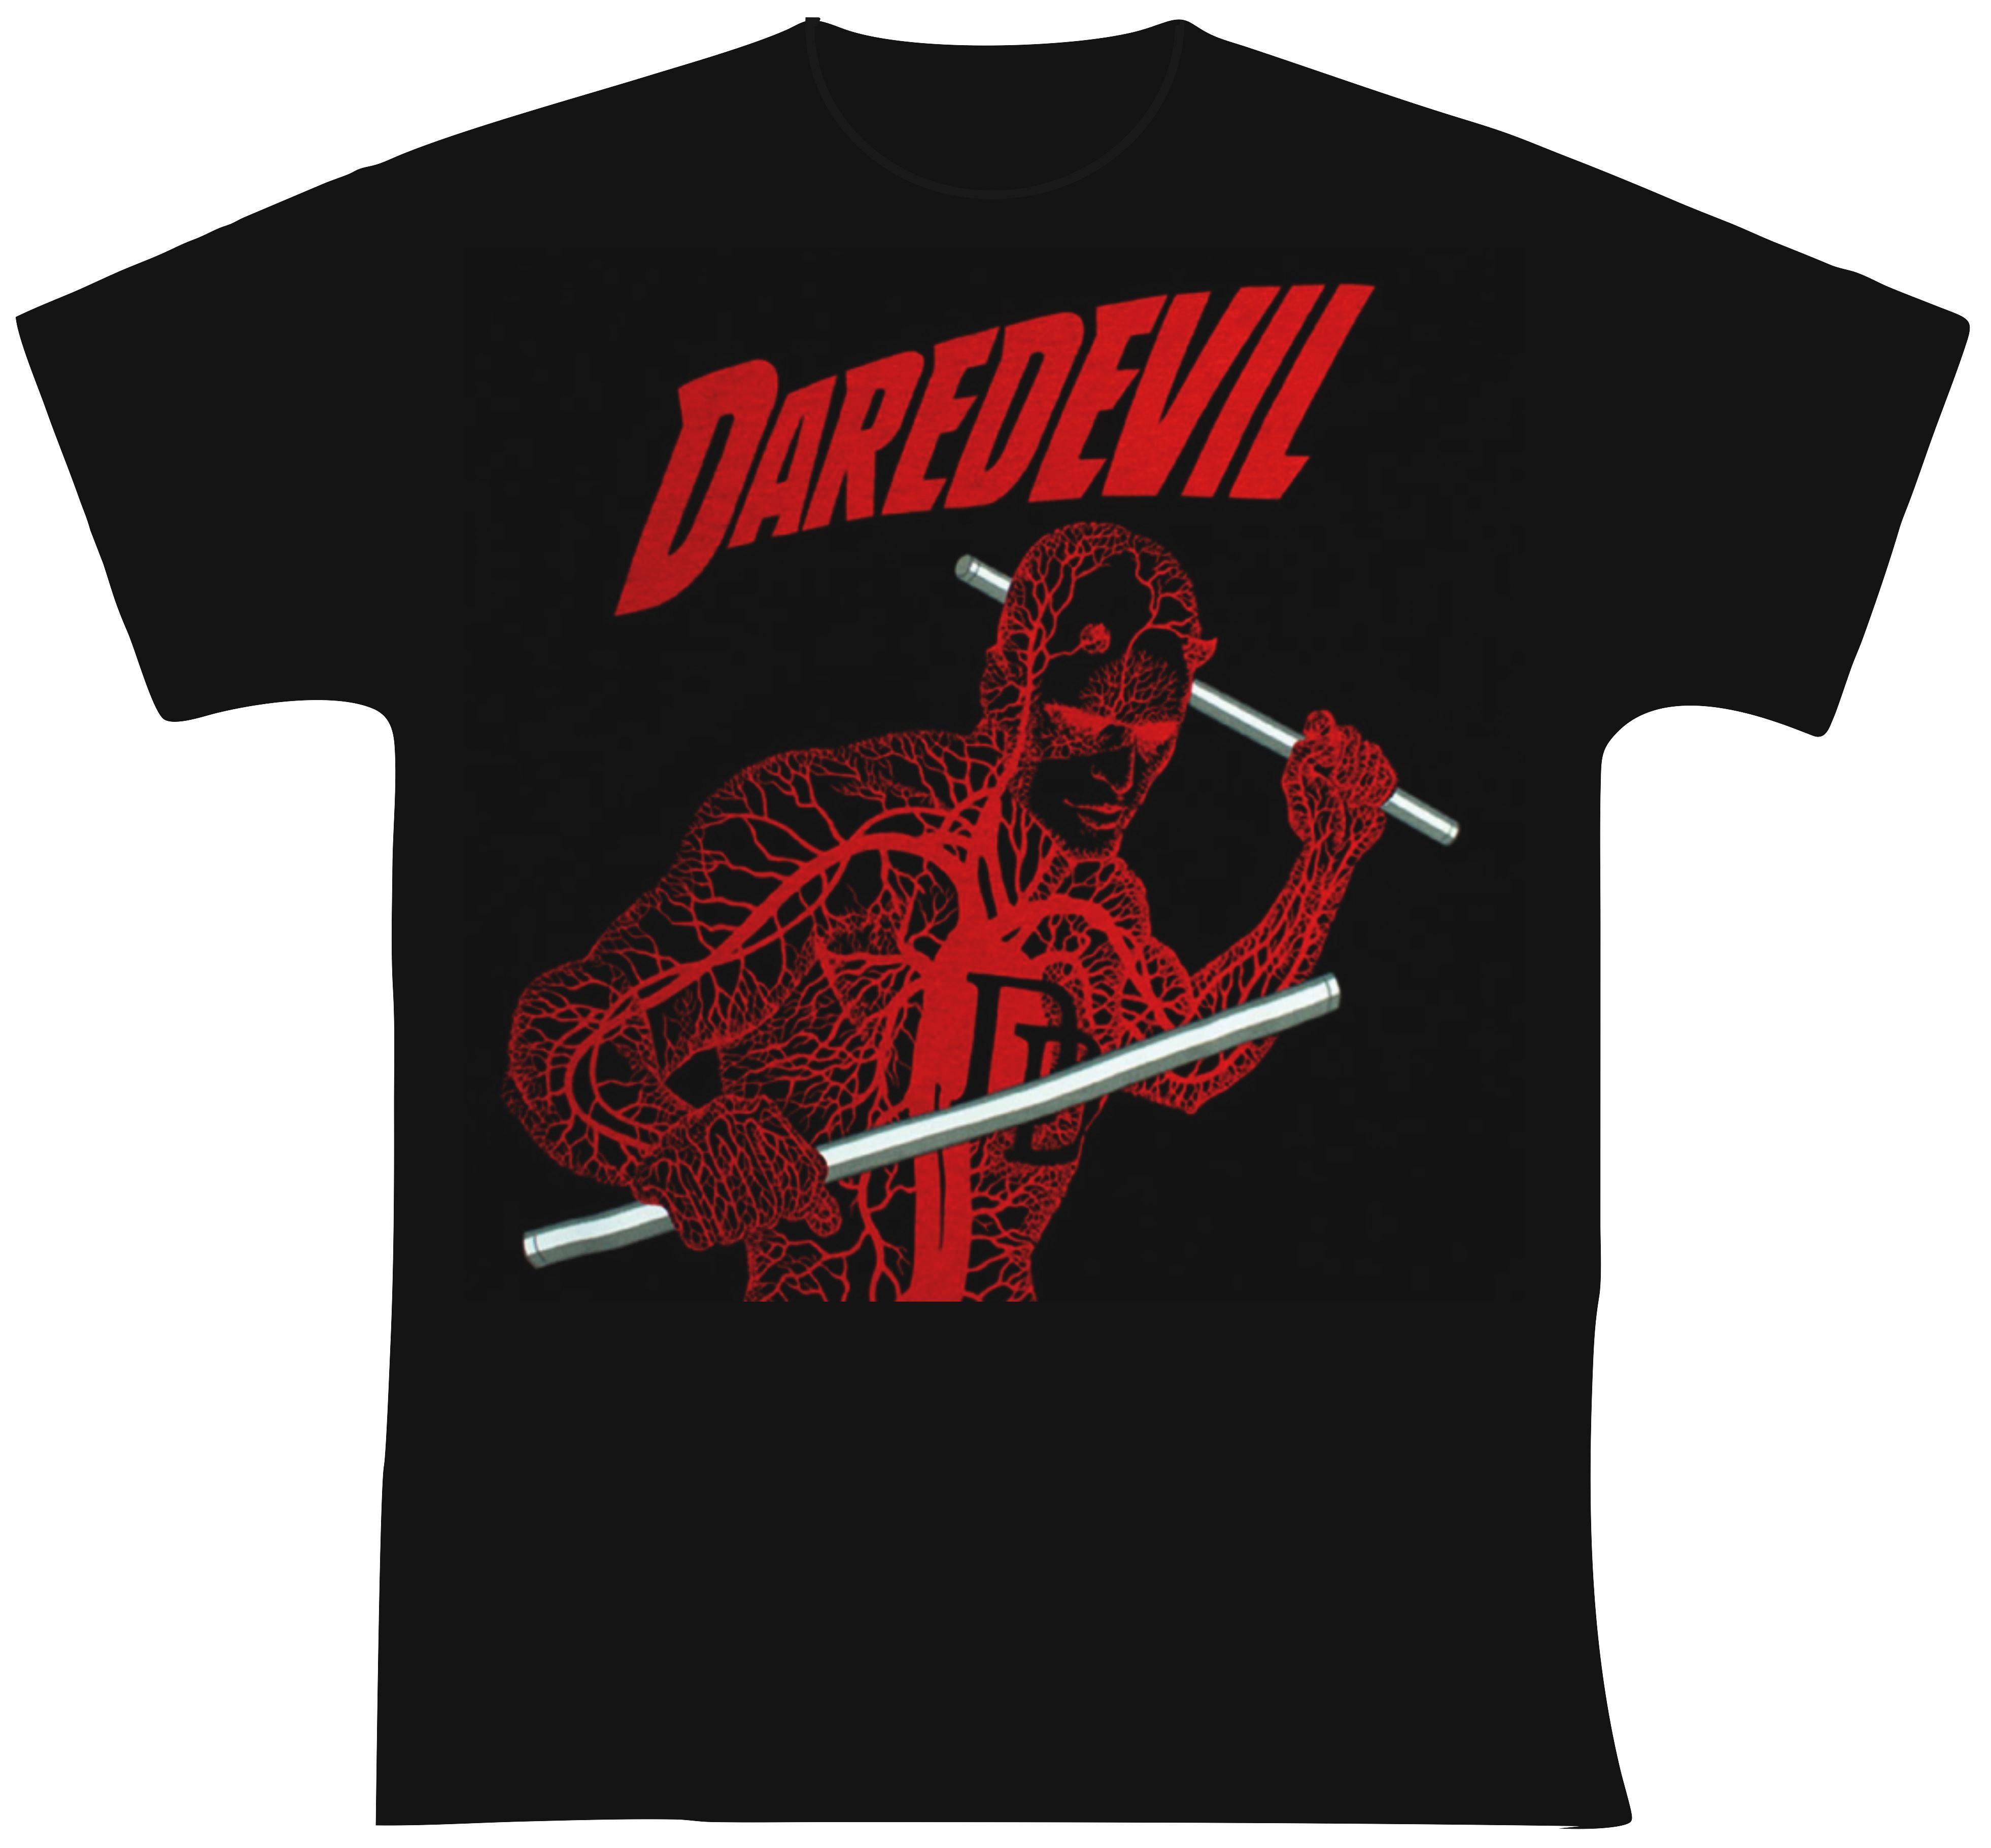 Daredevil/Demolidor R$ 35,00 + frete Todas as cores